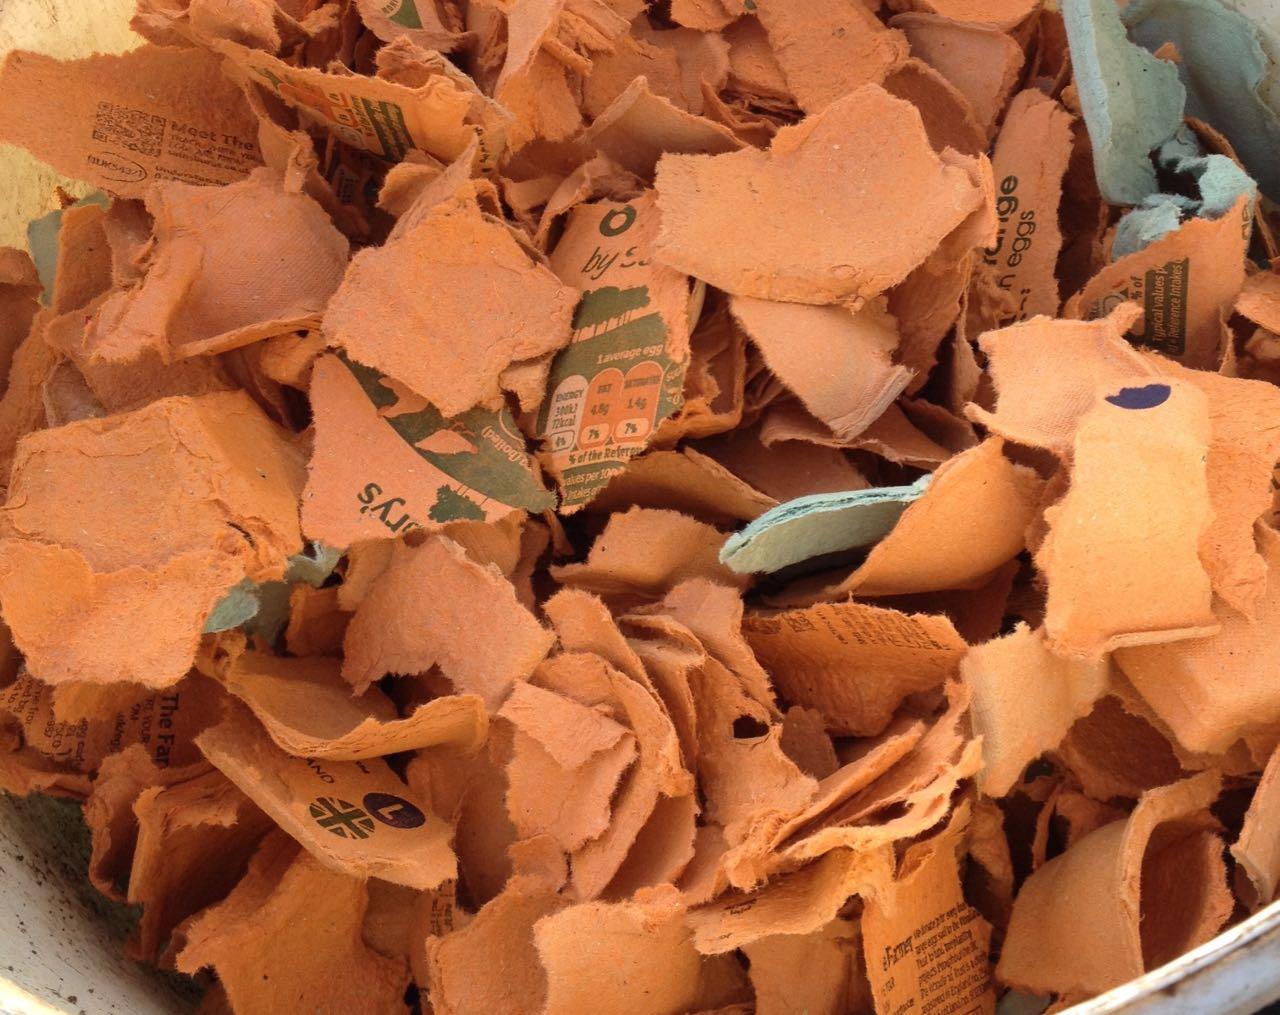 Egg box cardboard for the compost bin